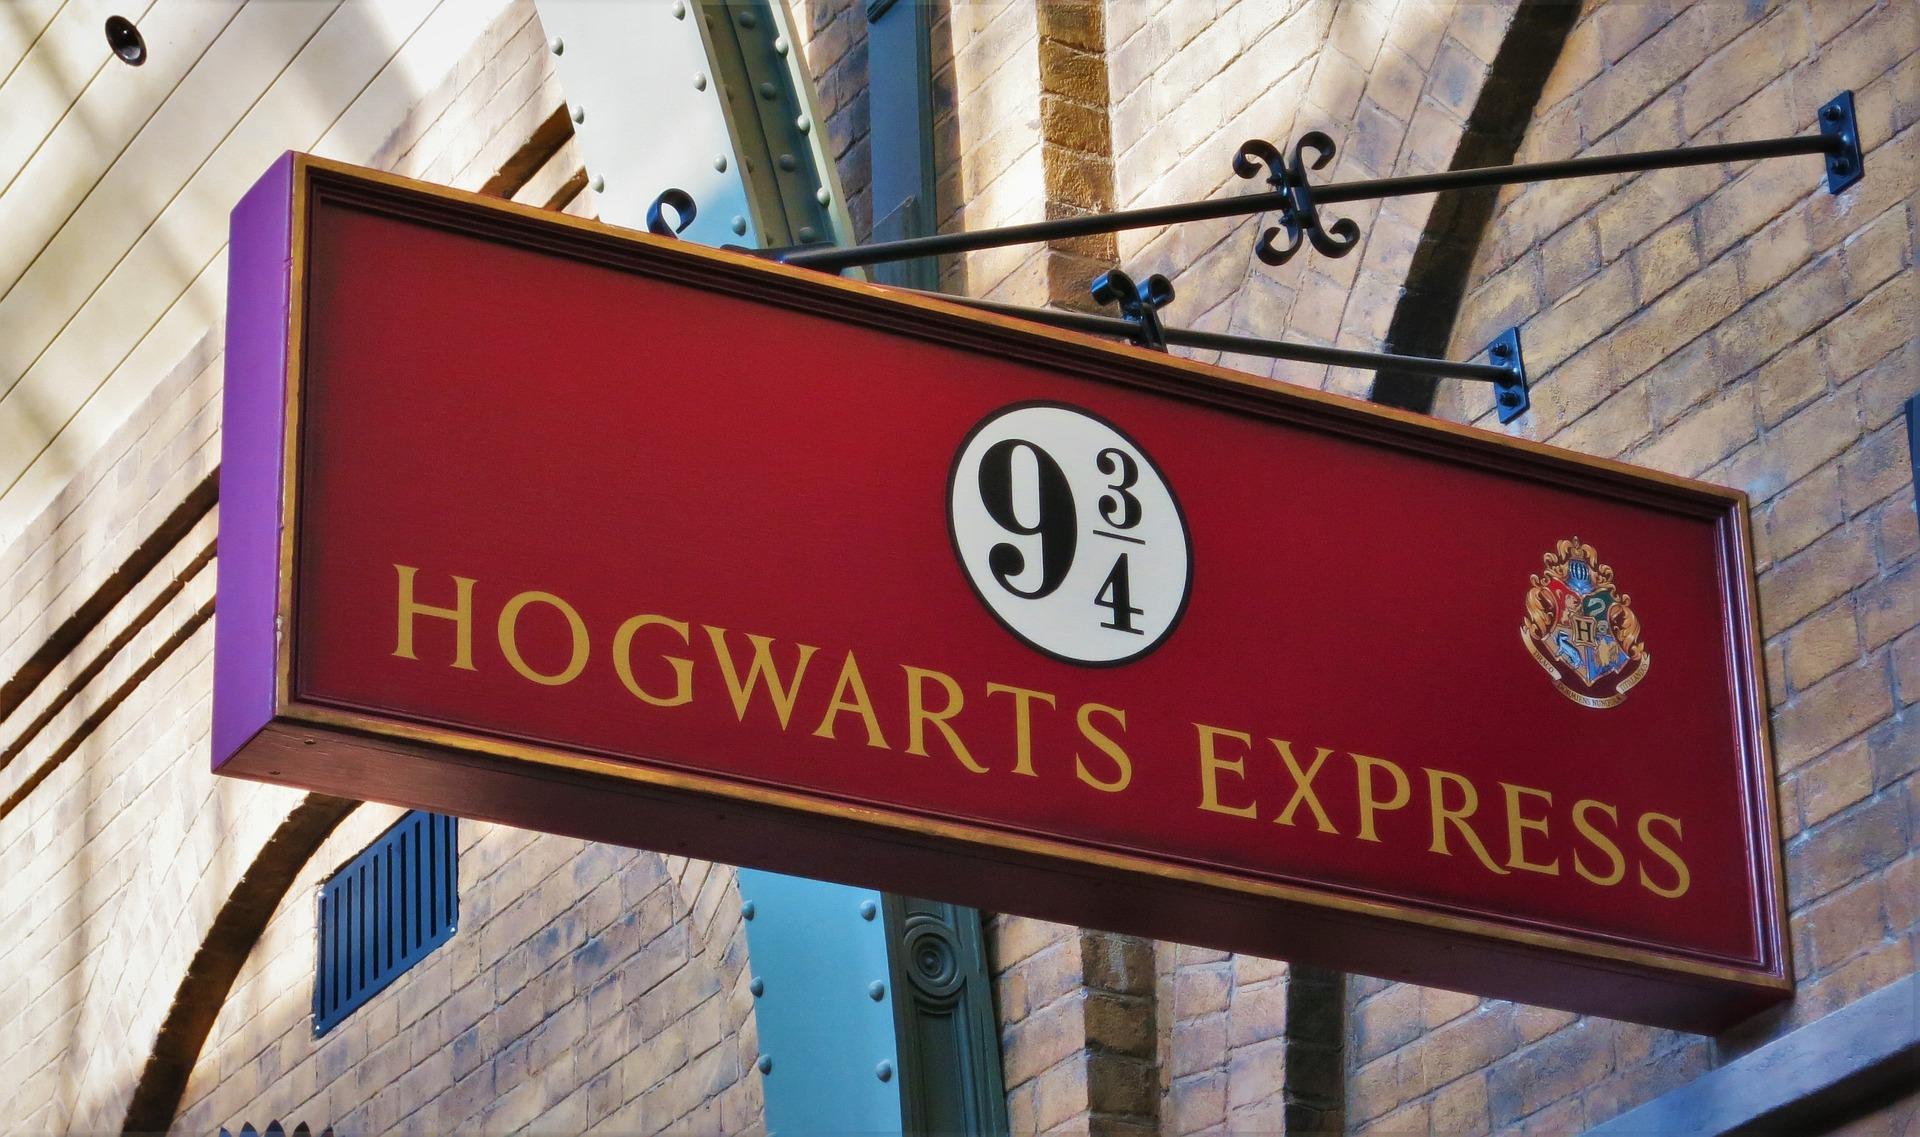 Pfingsten ab Gleis 9 ¾ – Kolping nimmt den Hogwarts-Express